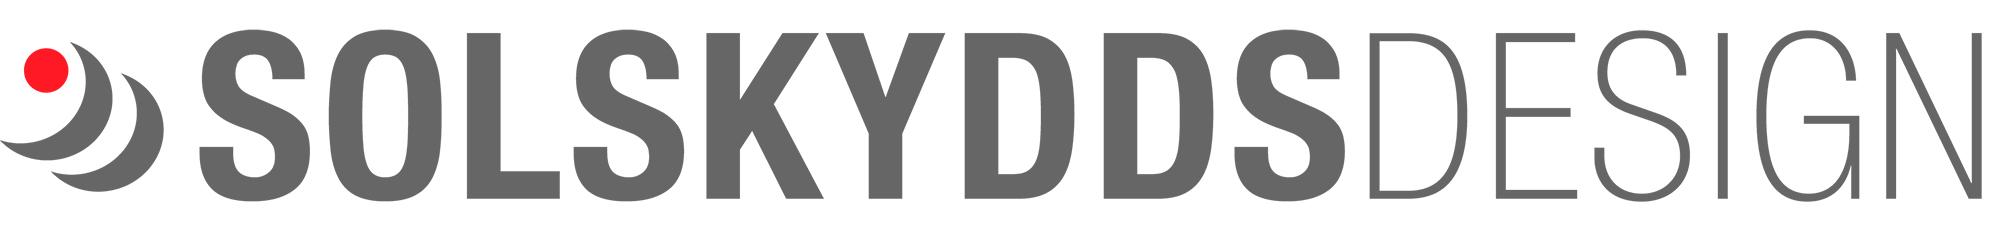 Solskyddsdesign Logotyp